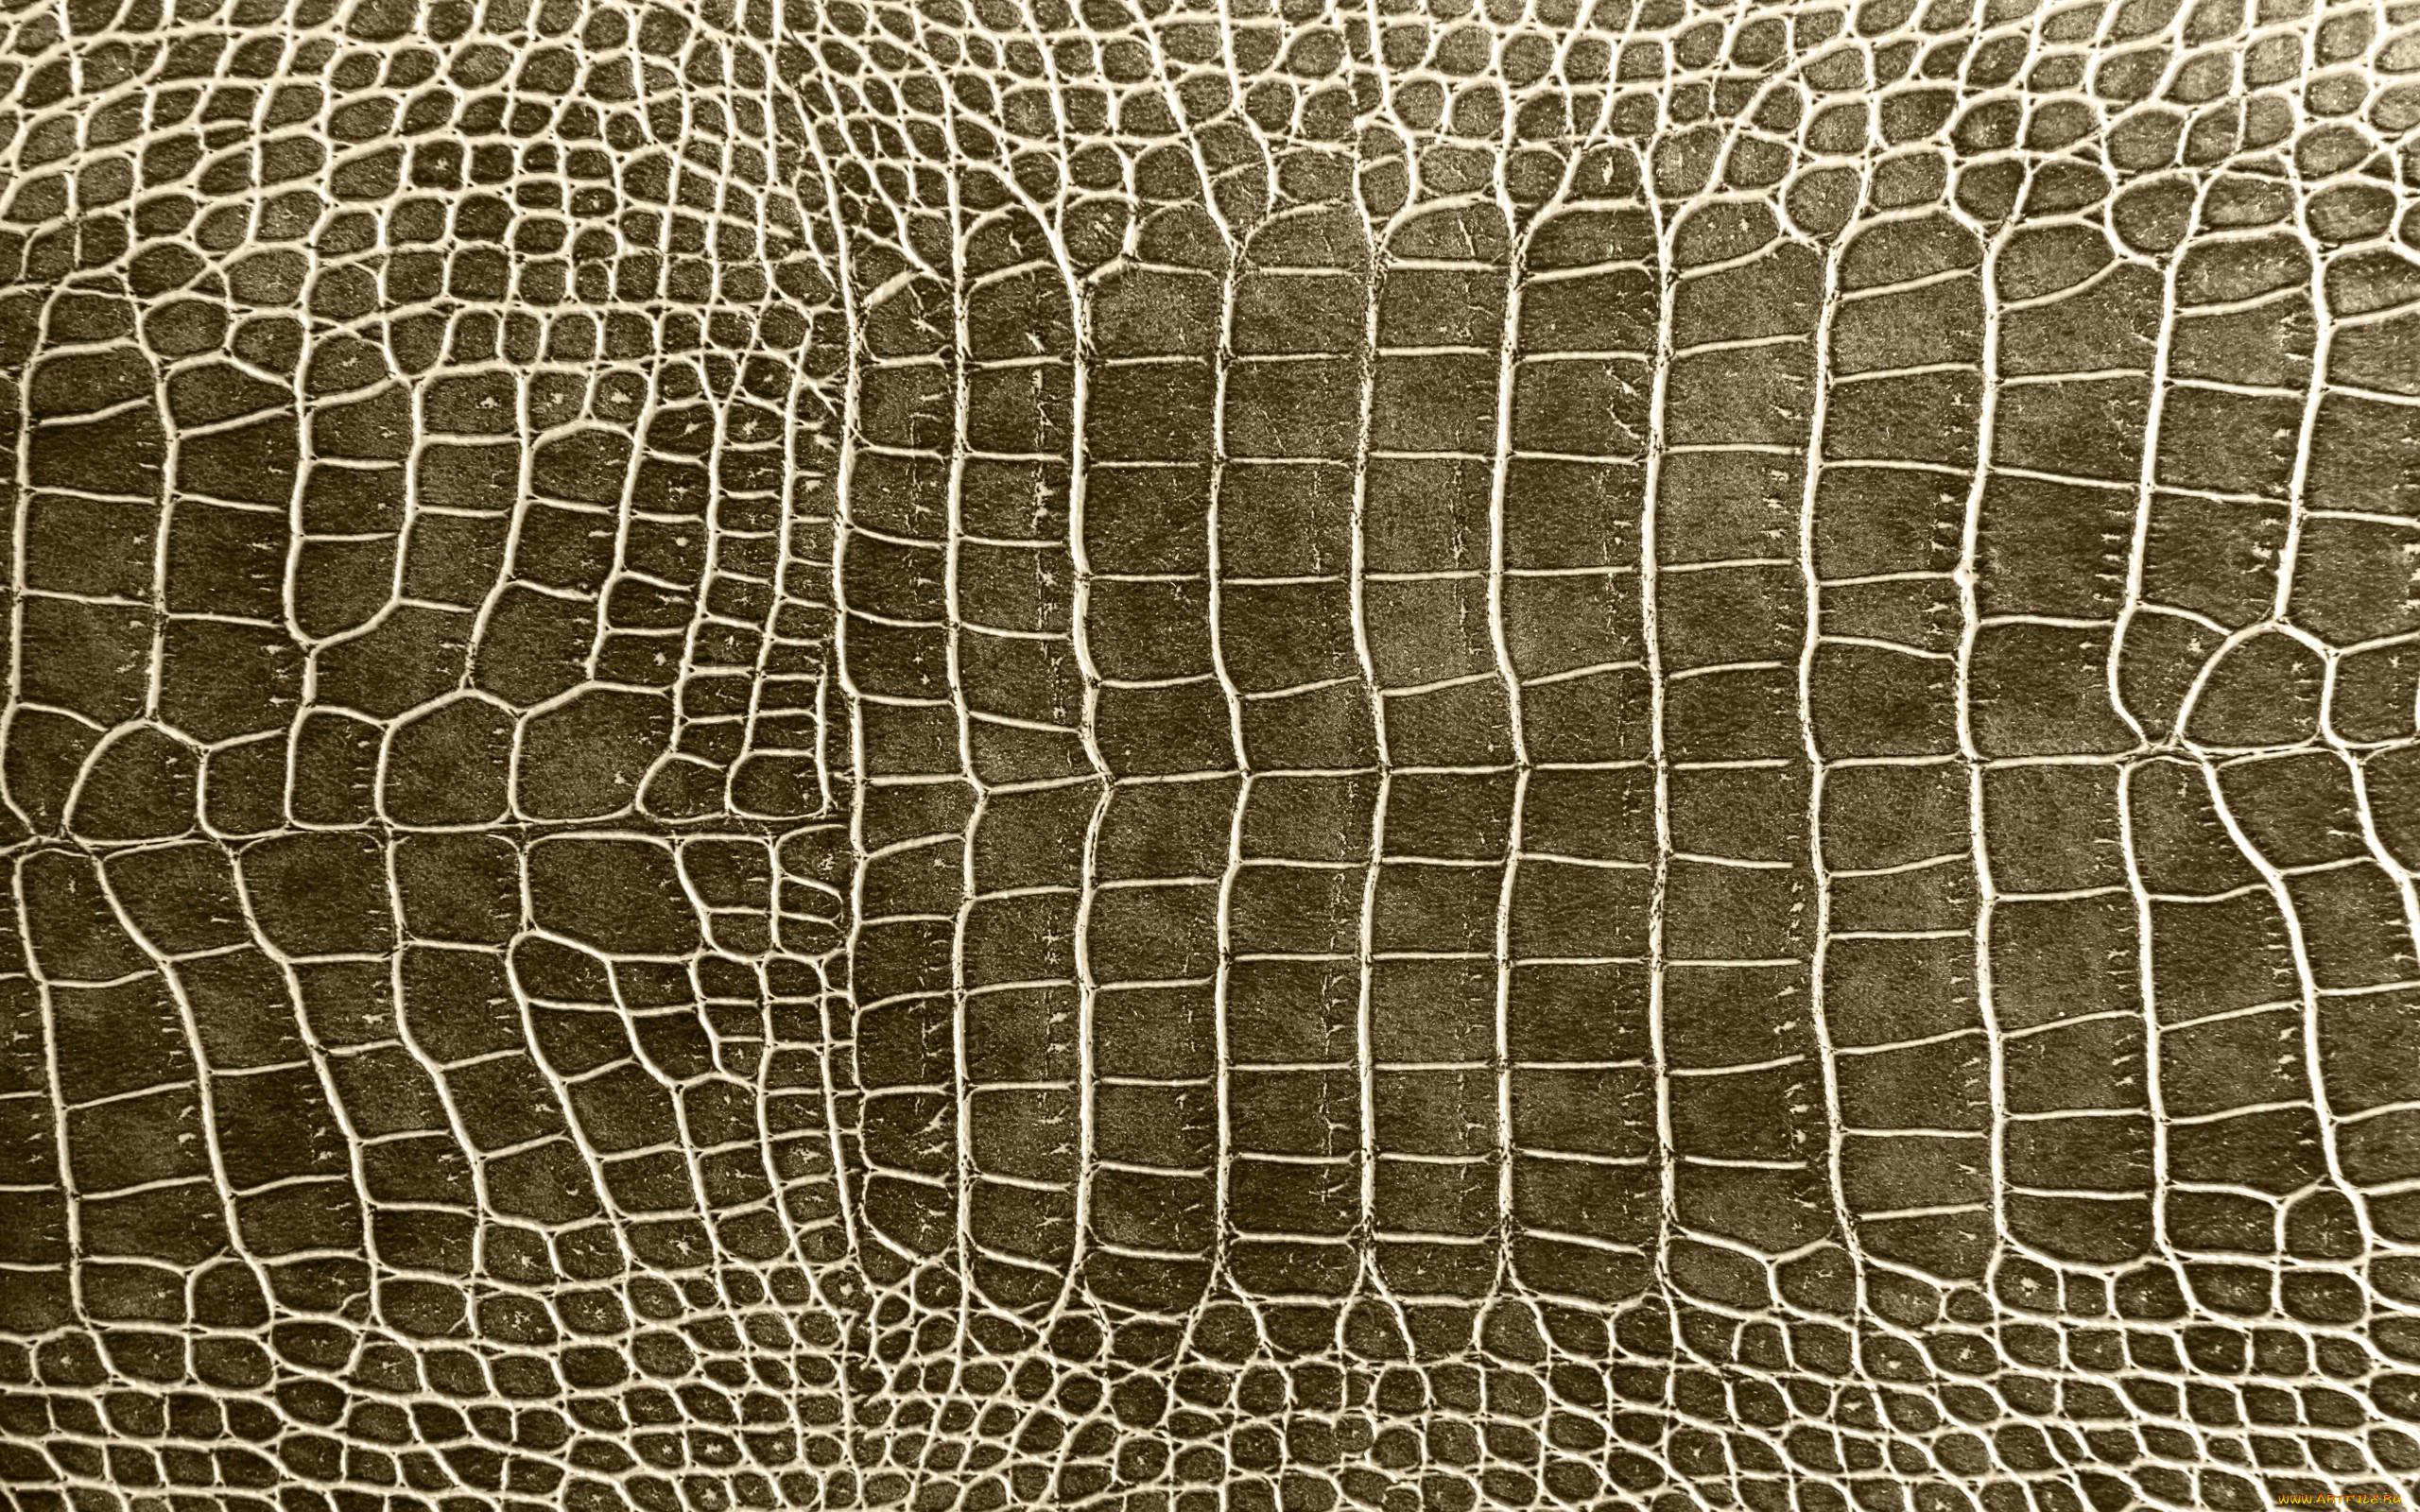 рисунок кожи крокодила одном видно